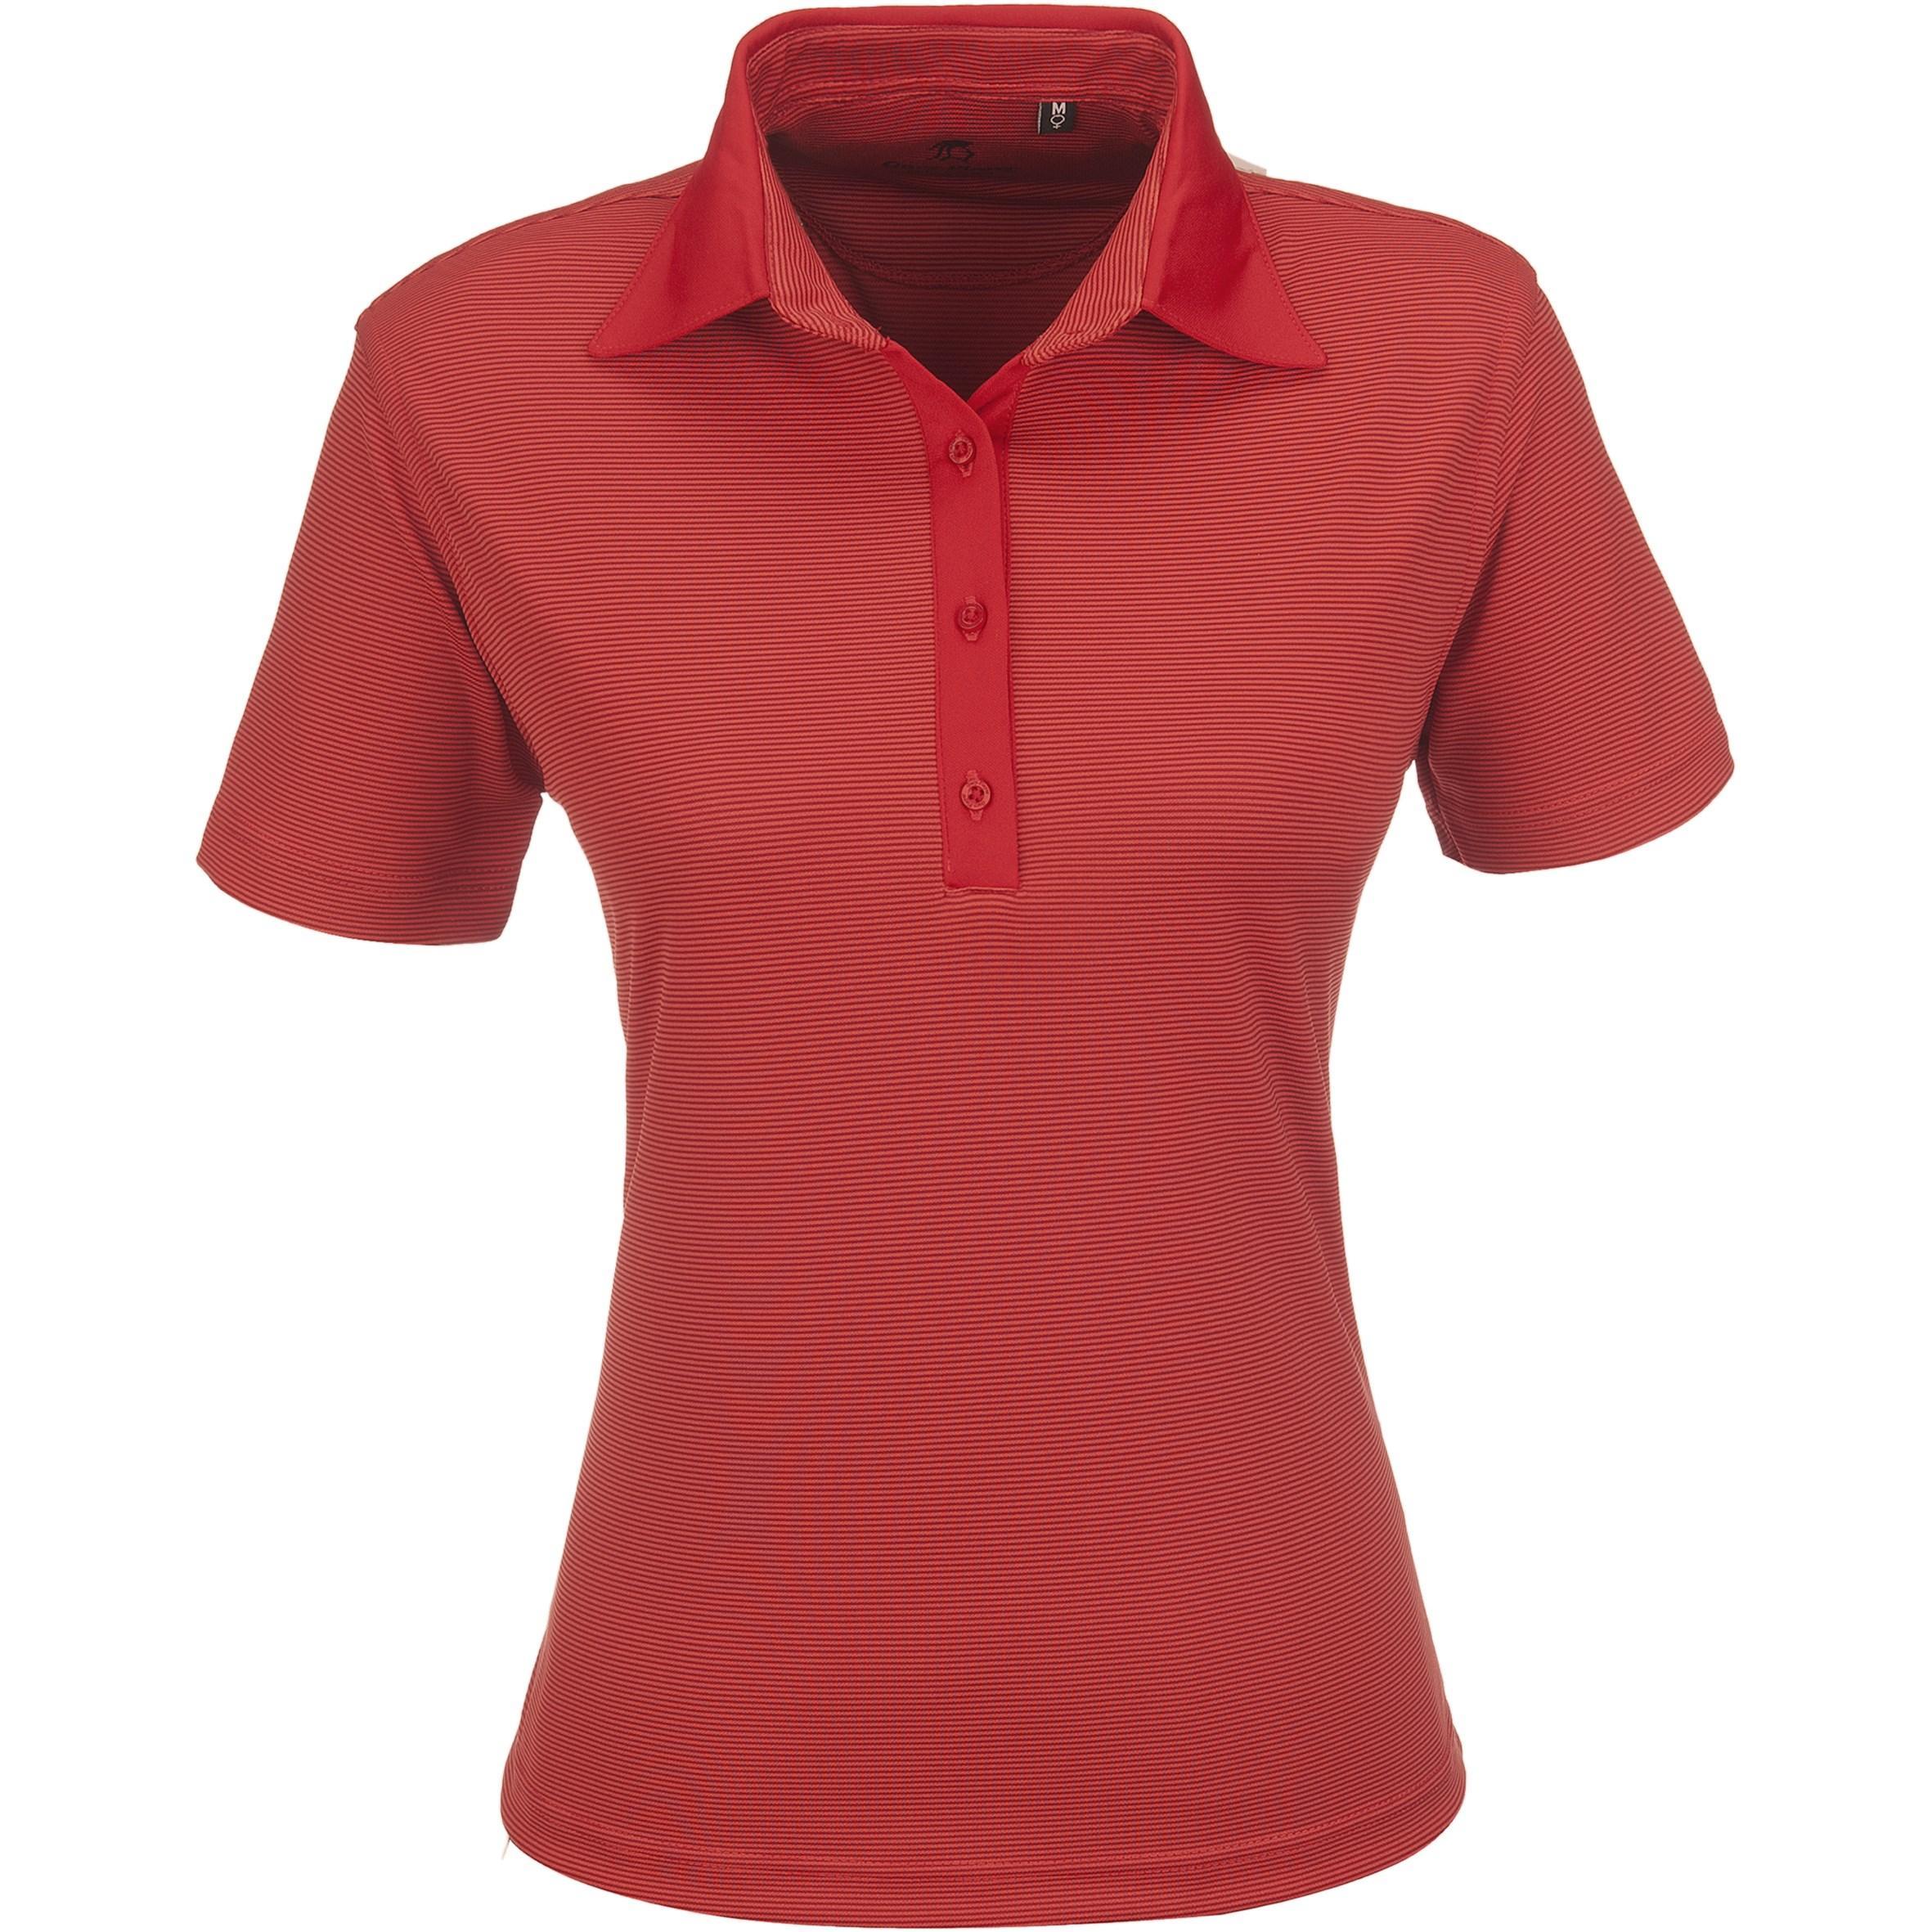 Ladies Michigan Golf Shirt - Red Only